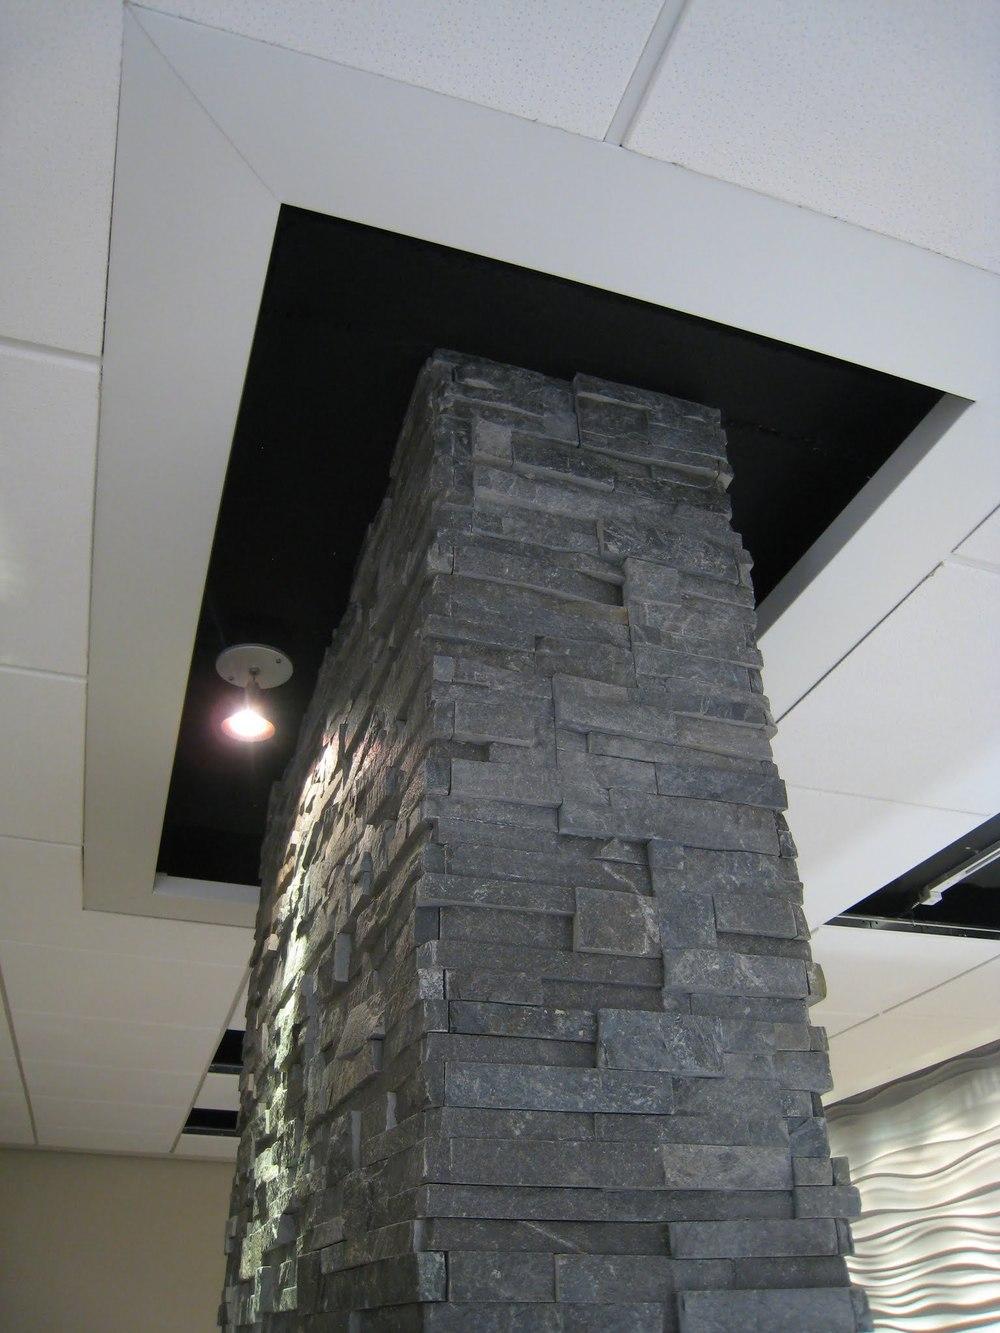 kodner jeweler stone column ceiling termination.jpg